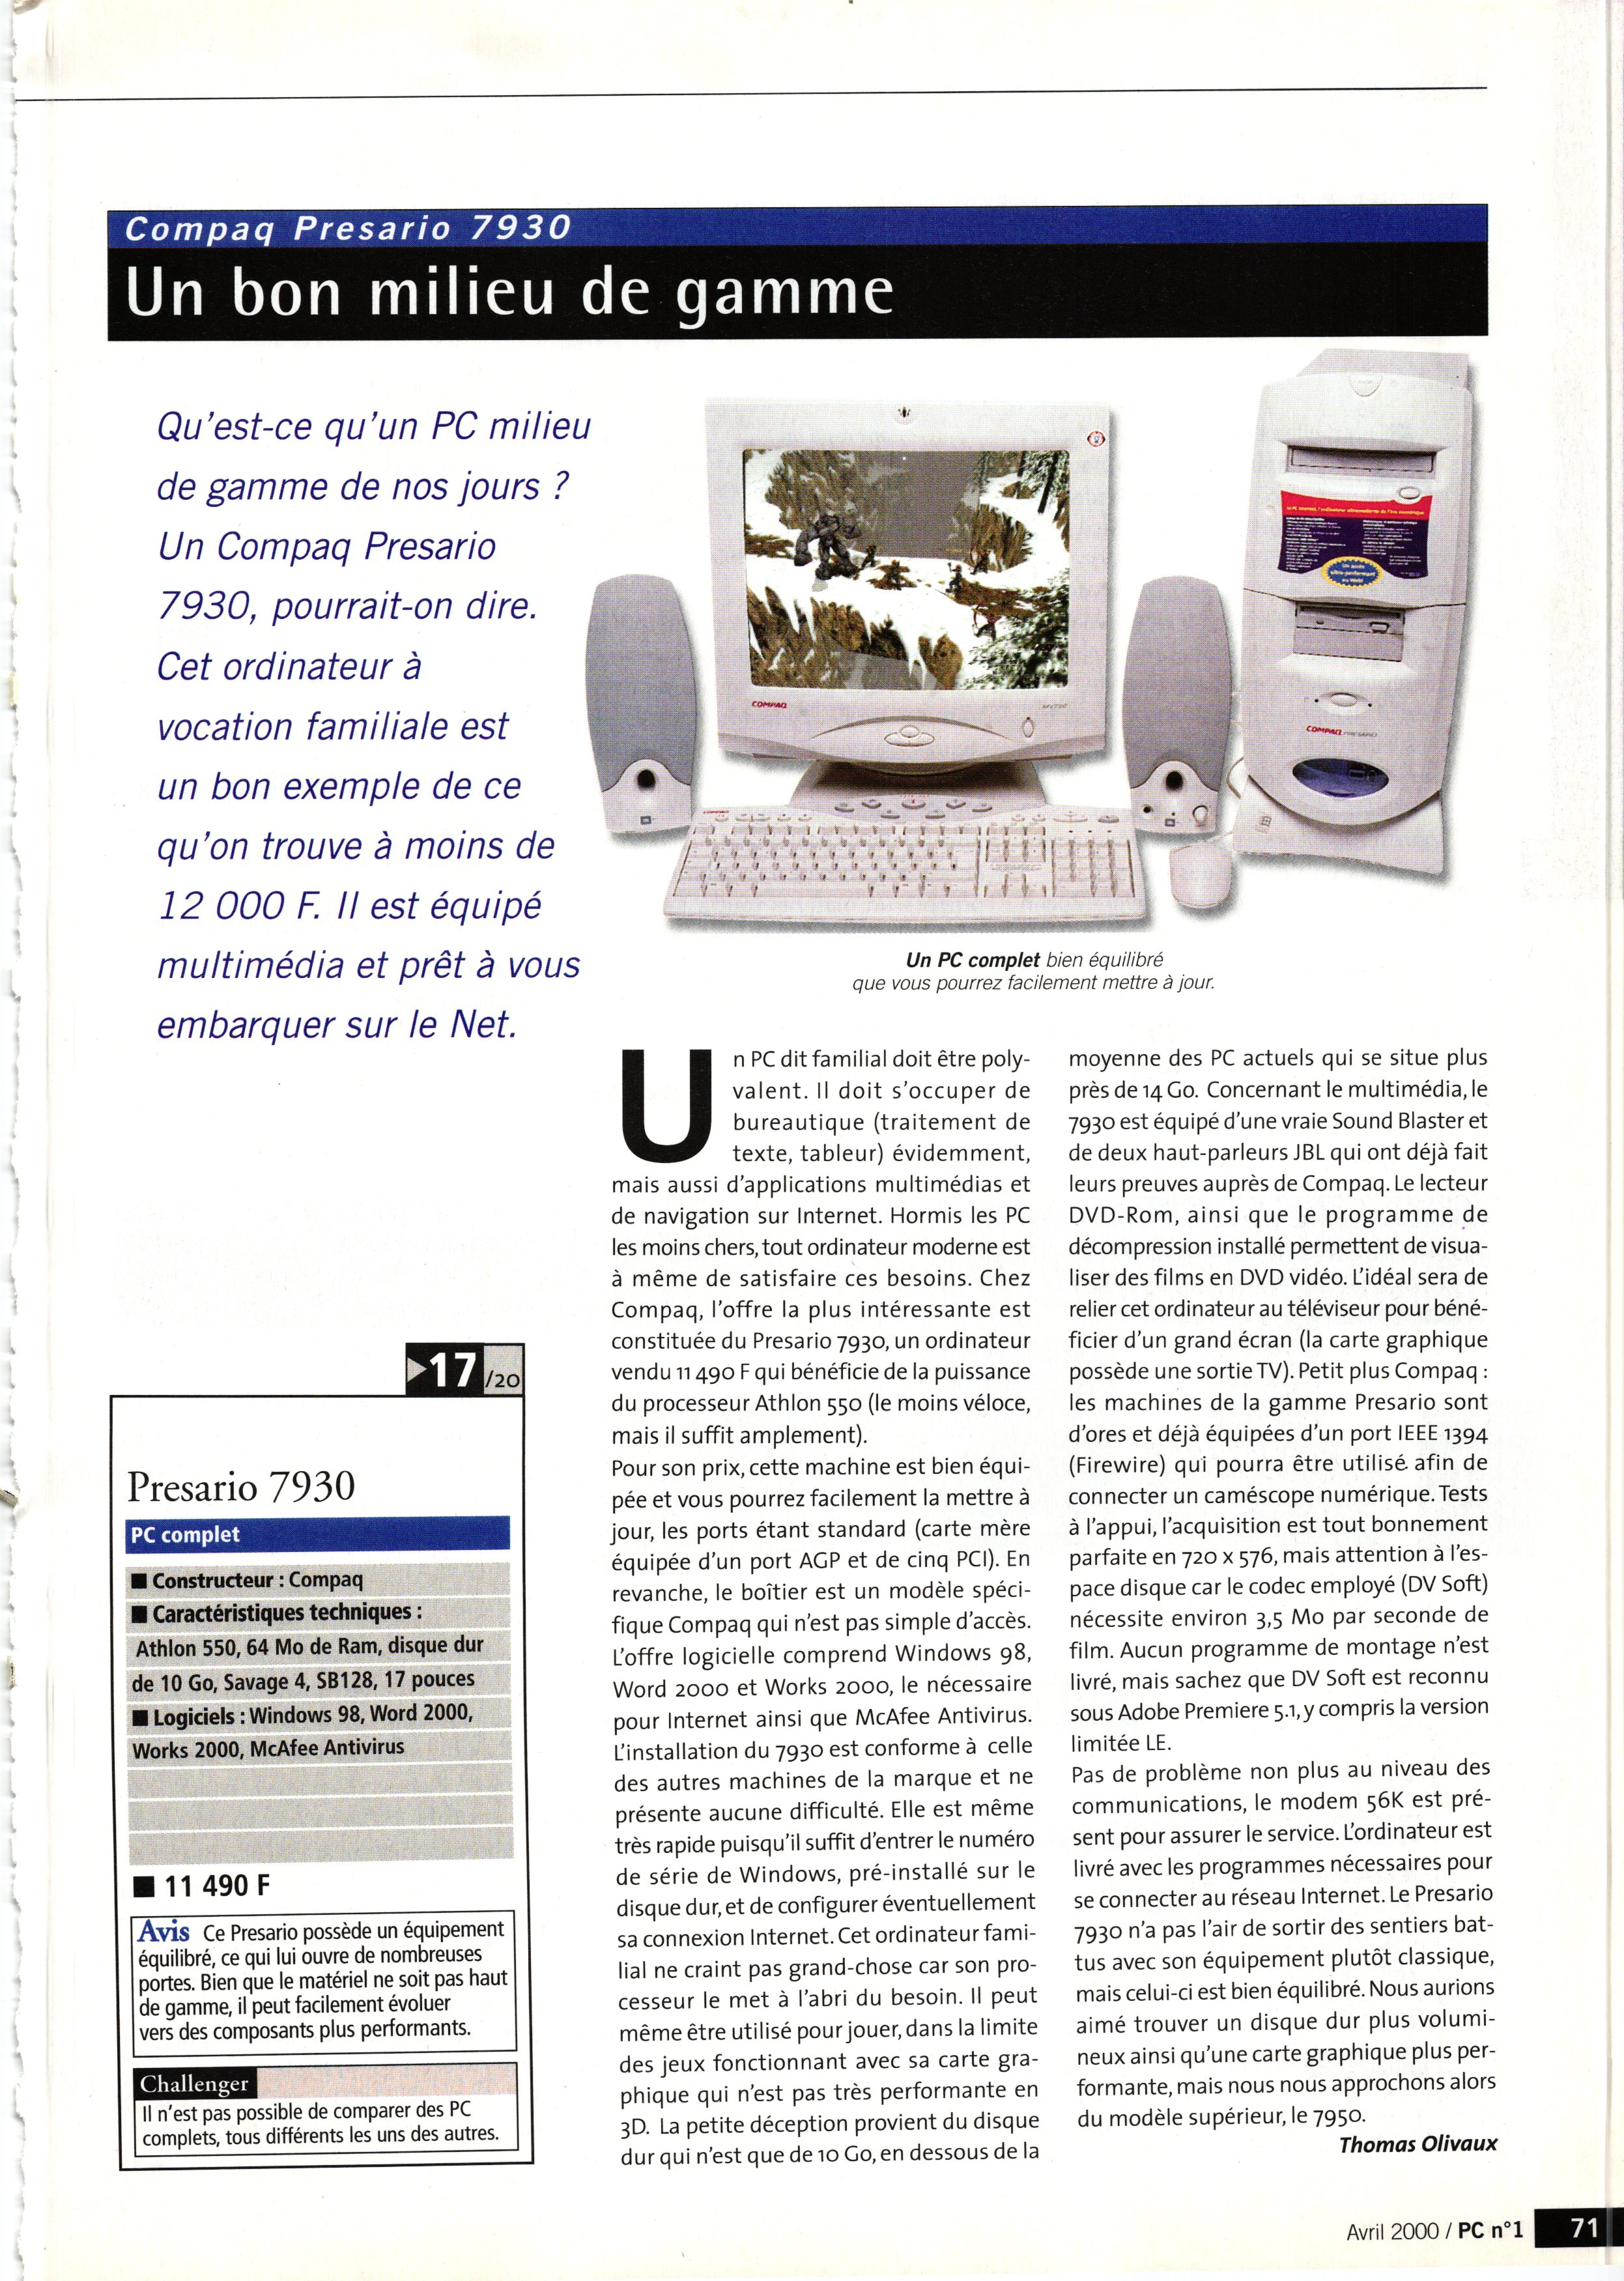 http://download.abandonware.org/magazines/PC%20N1/pcn1_numero04/p_071.jpg